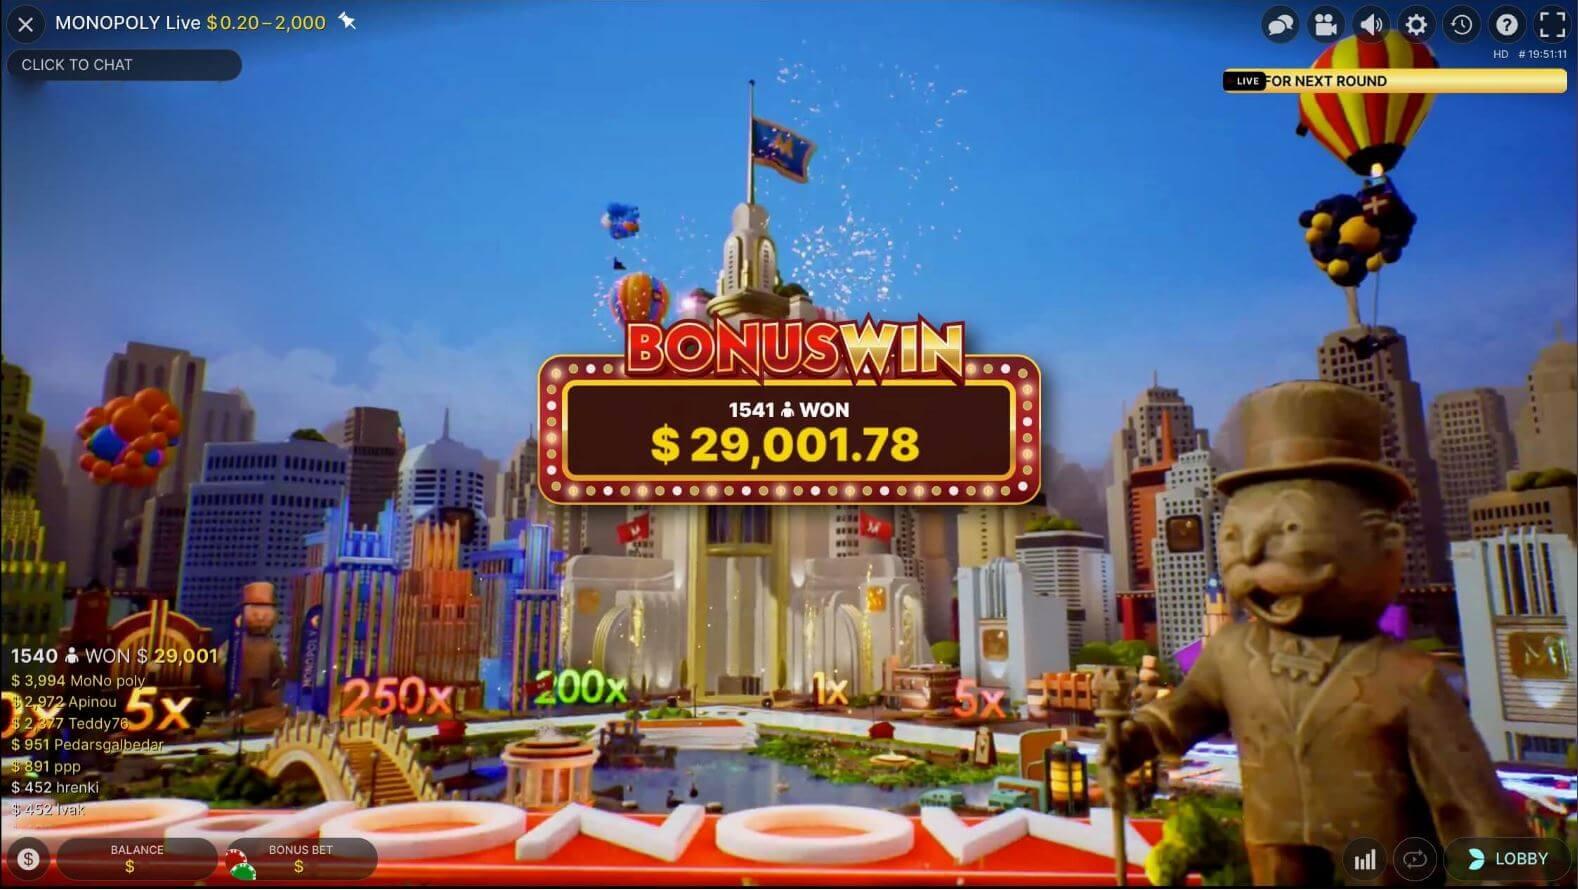 Monopoly Live bonuswinst-minified